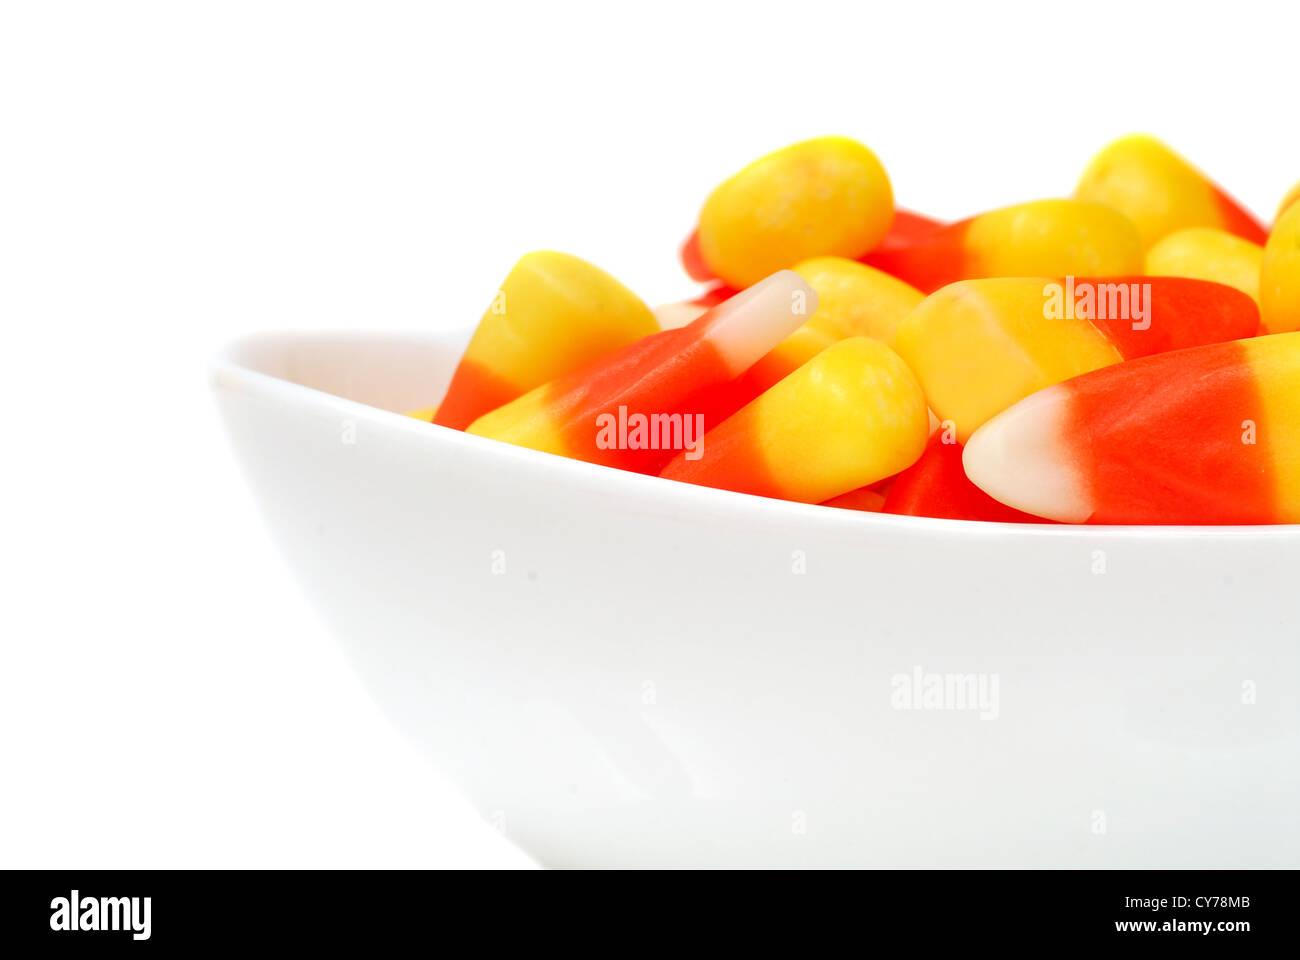 Candy Corn Stockfotos & Candy Corn Bilder - Alamy